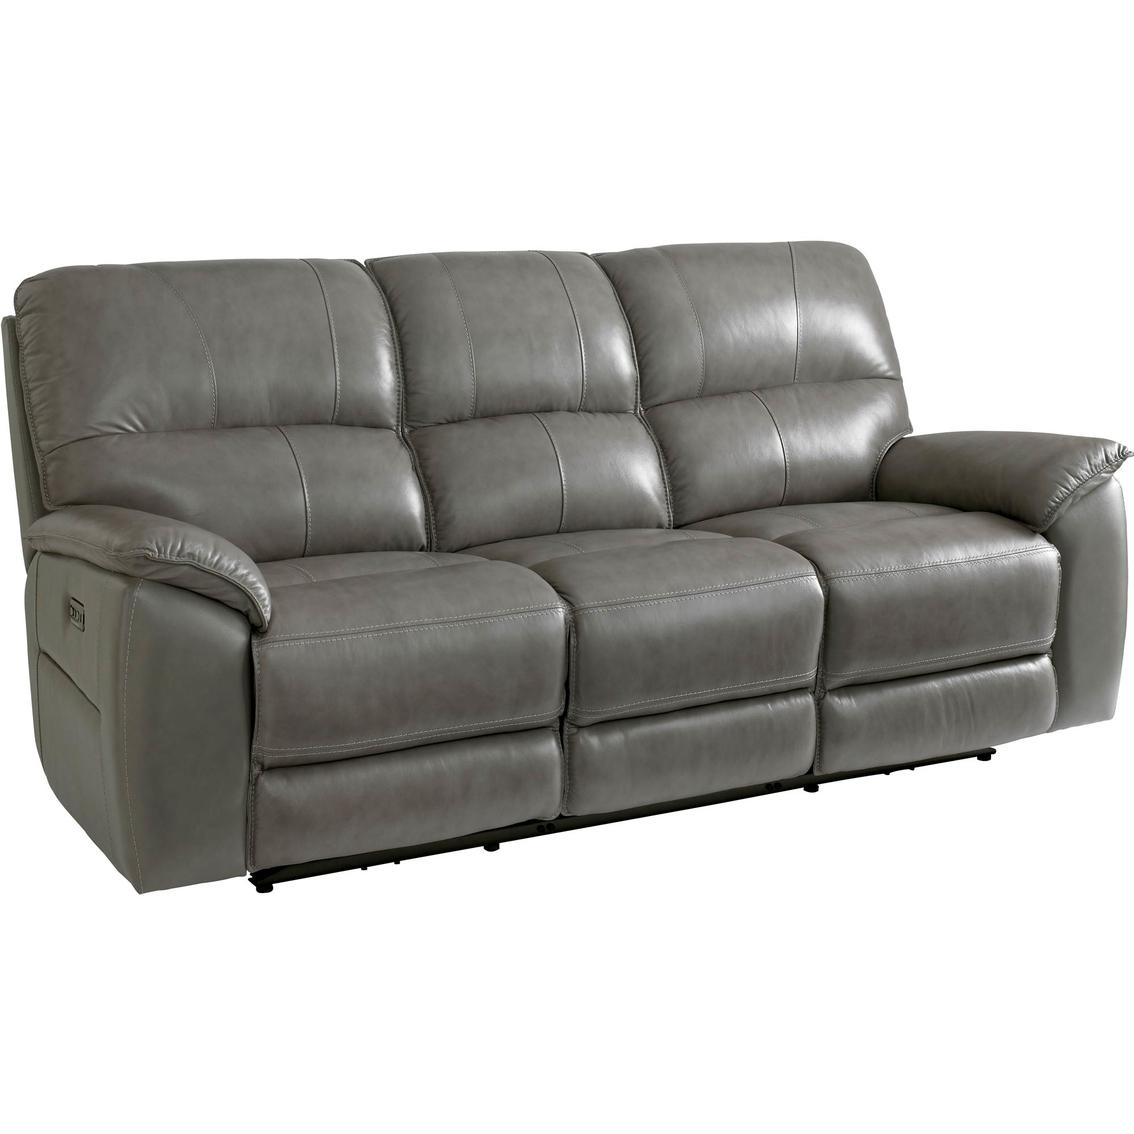 Bassett Club Level Benson Power Reclining Sofa